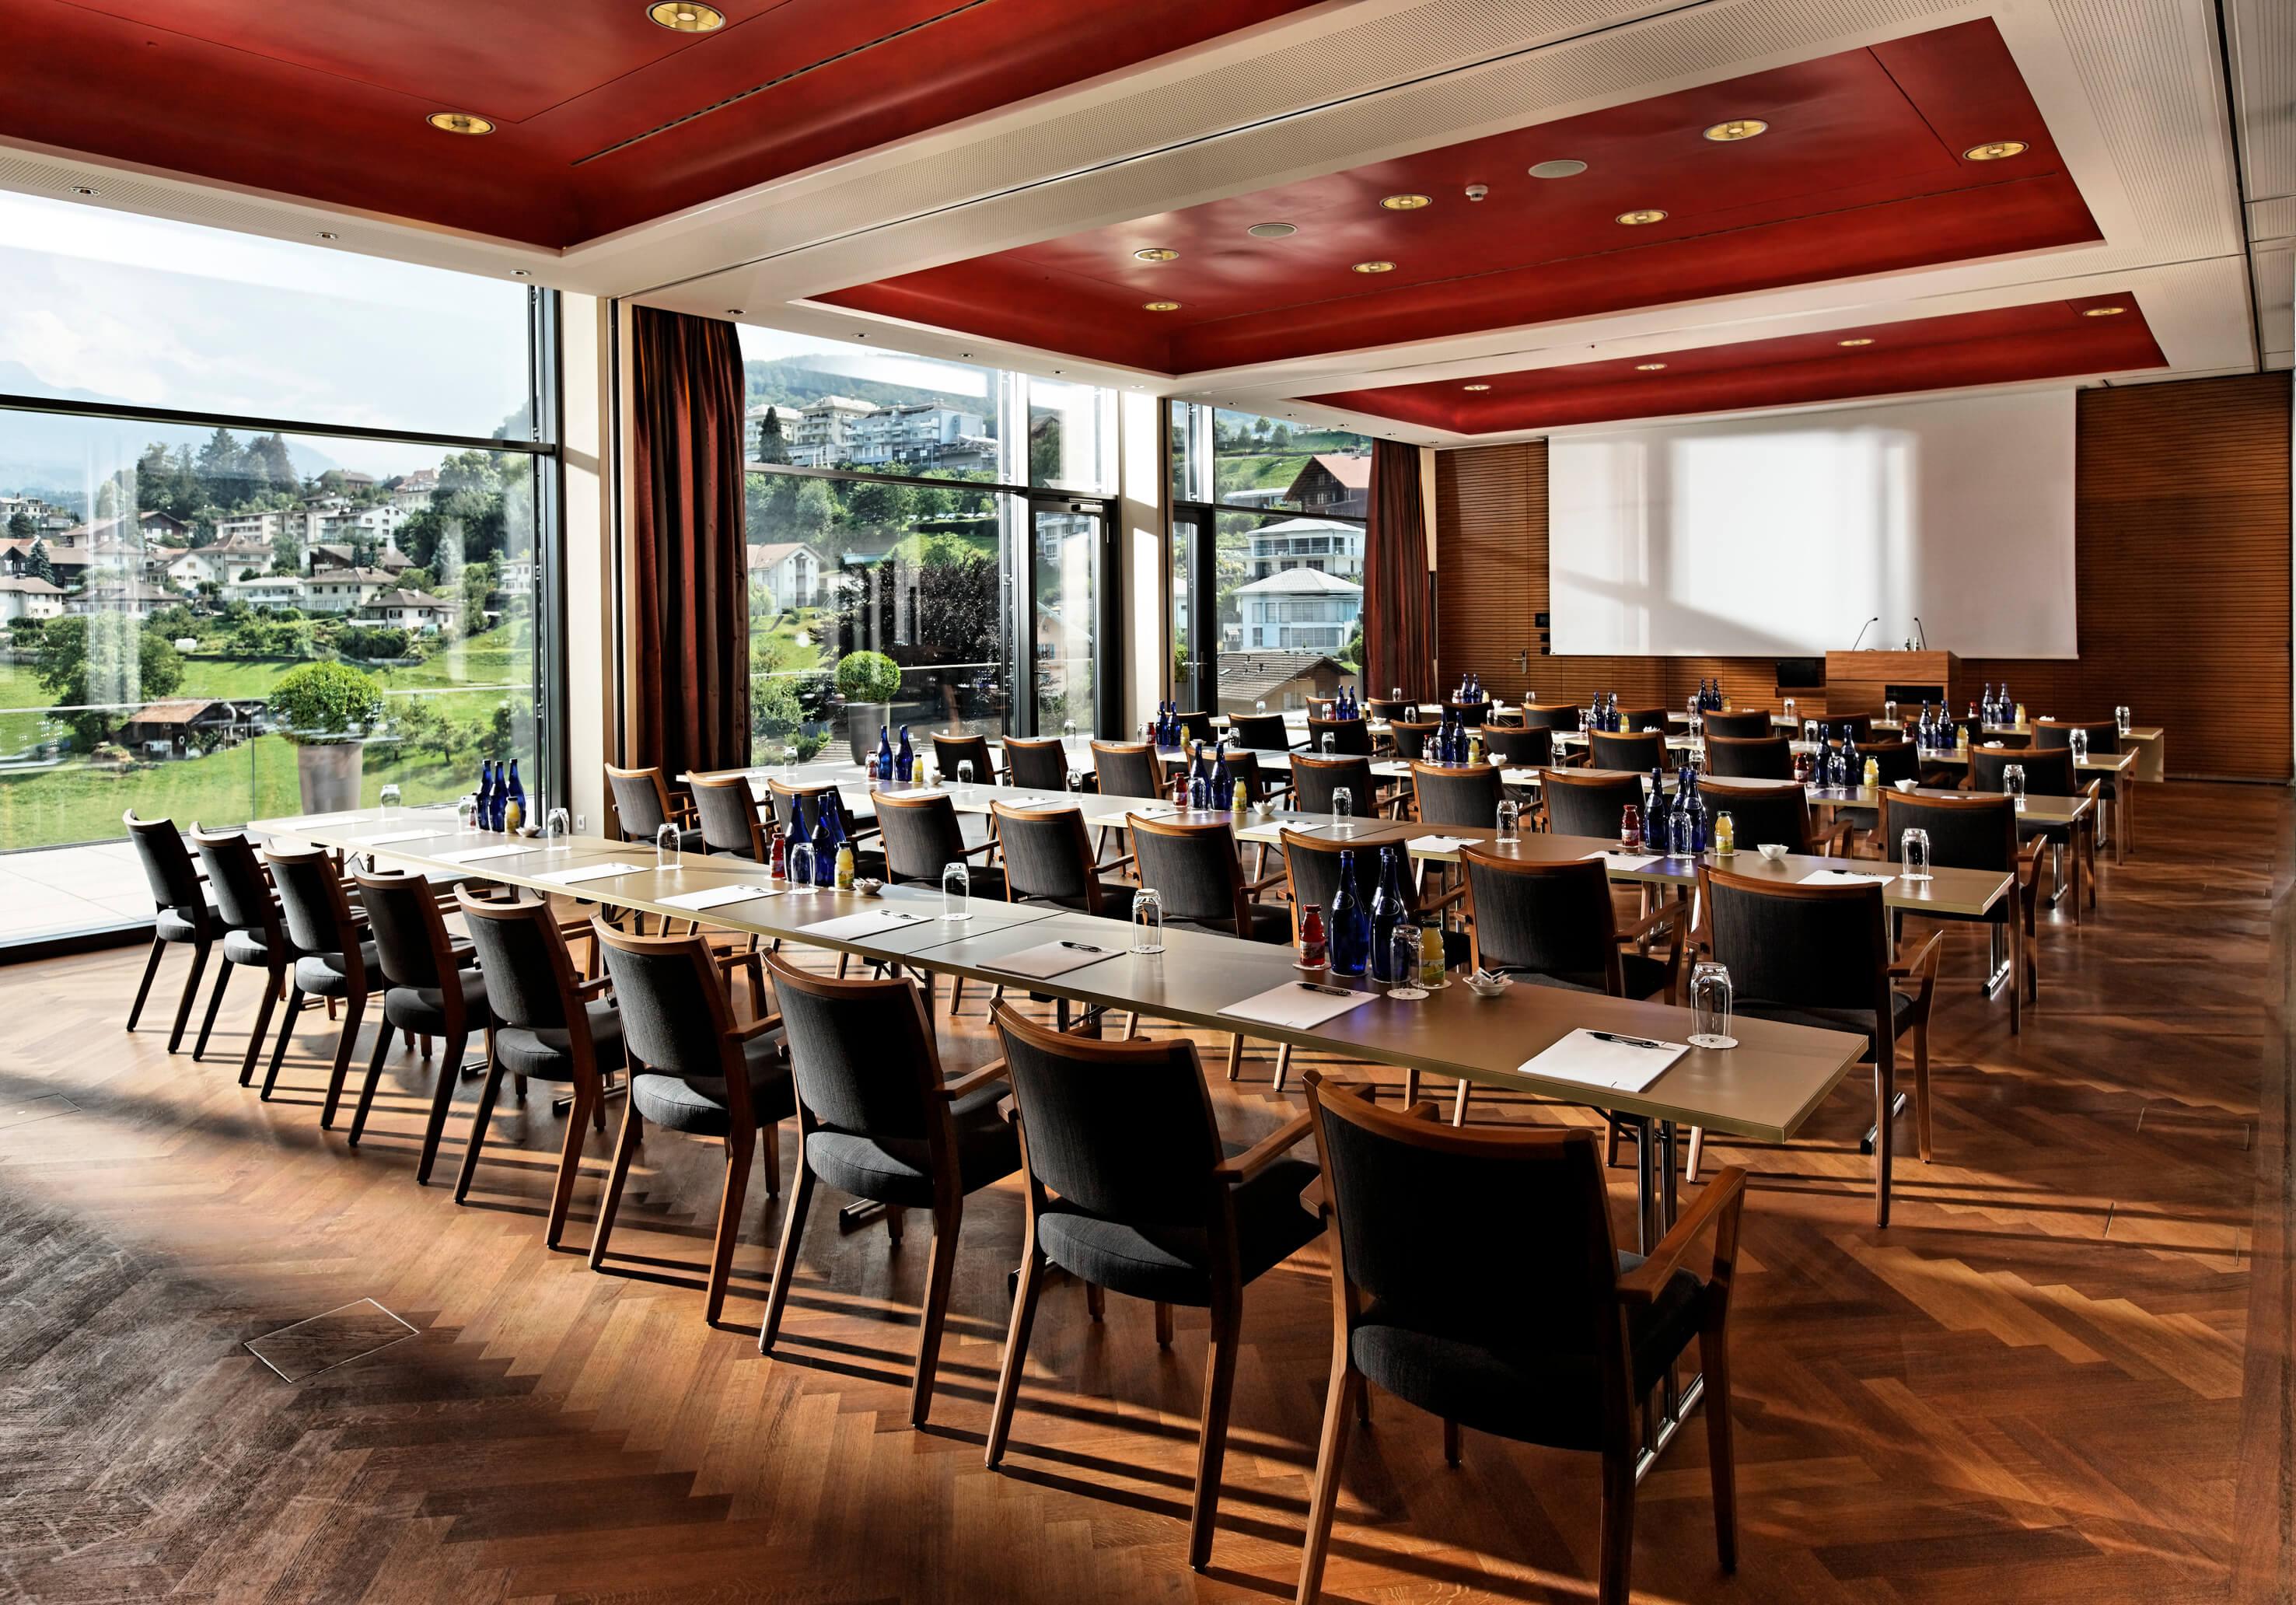 hotel-eden-meting-panoramasaal-mit-seminarbestuhlung-spiez.jpg